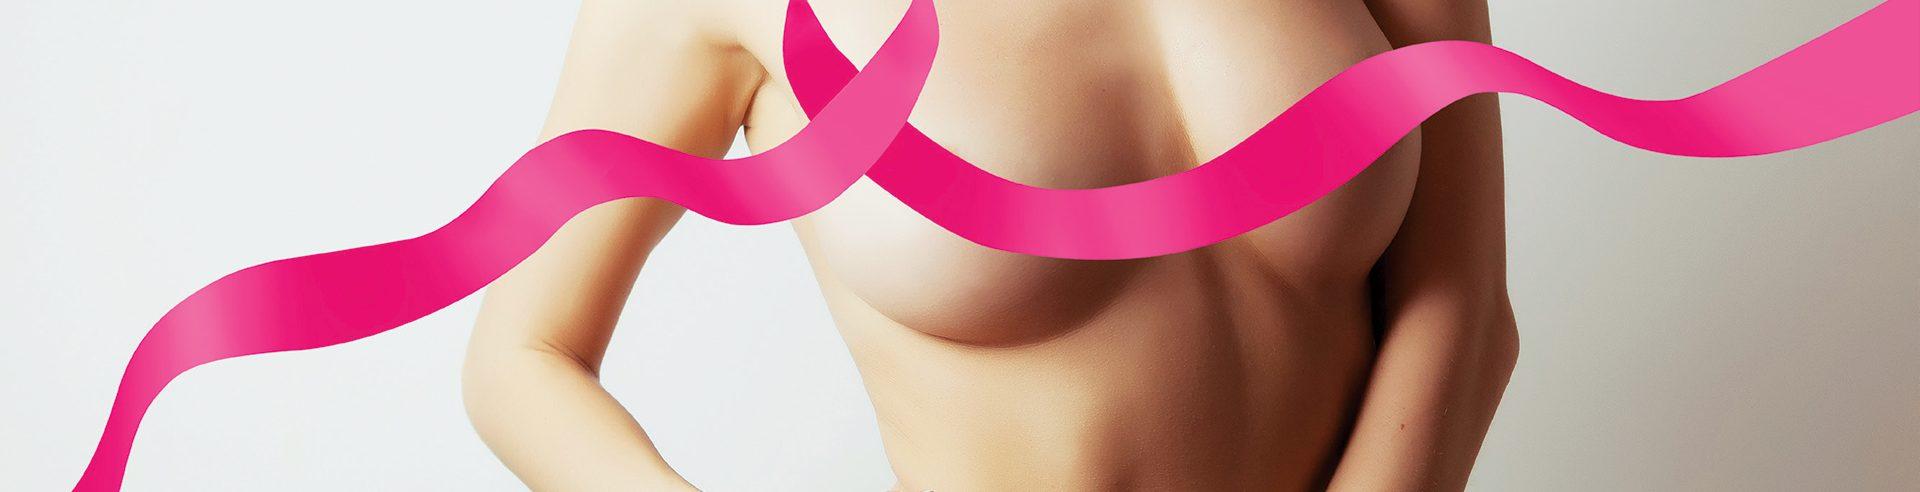 mammografia-3D-2